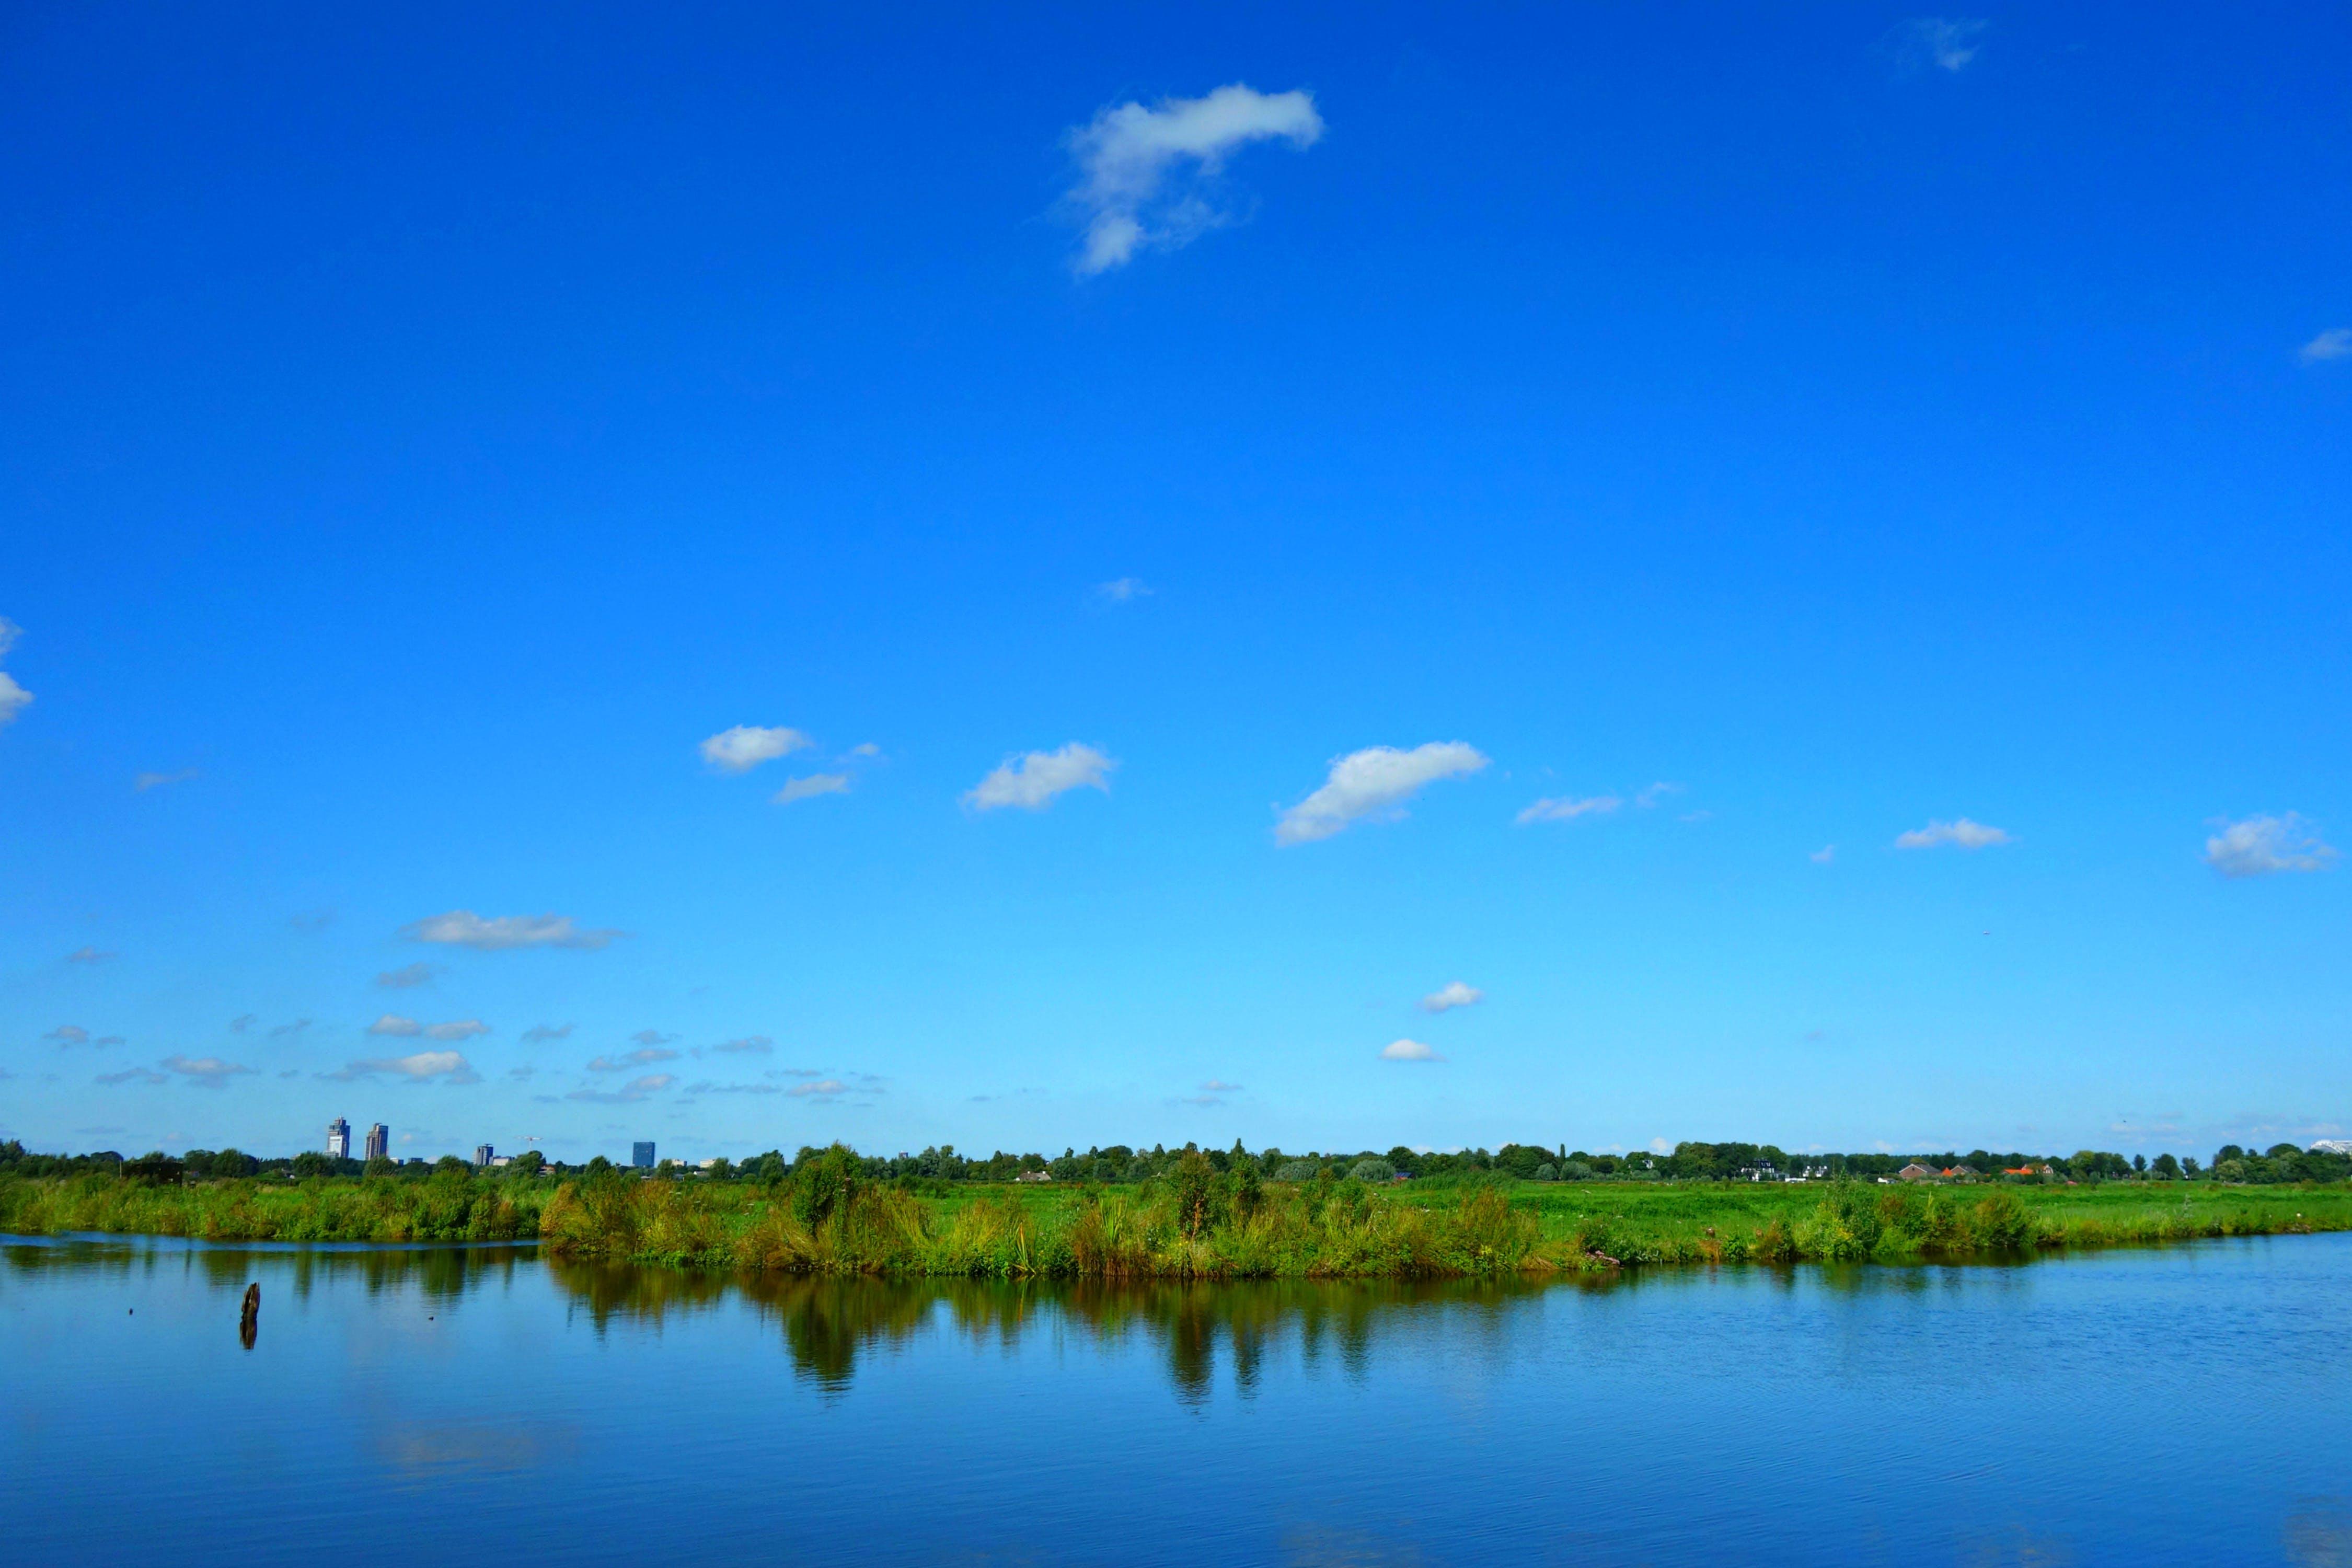 of blue sky, blue water, Dutch landscape, Holland